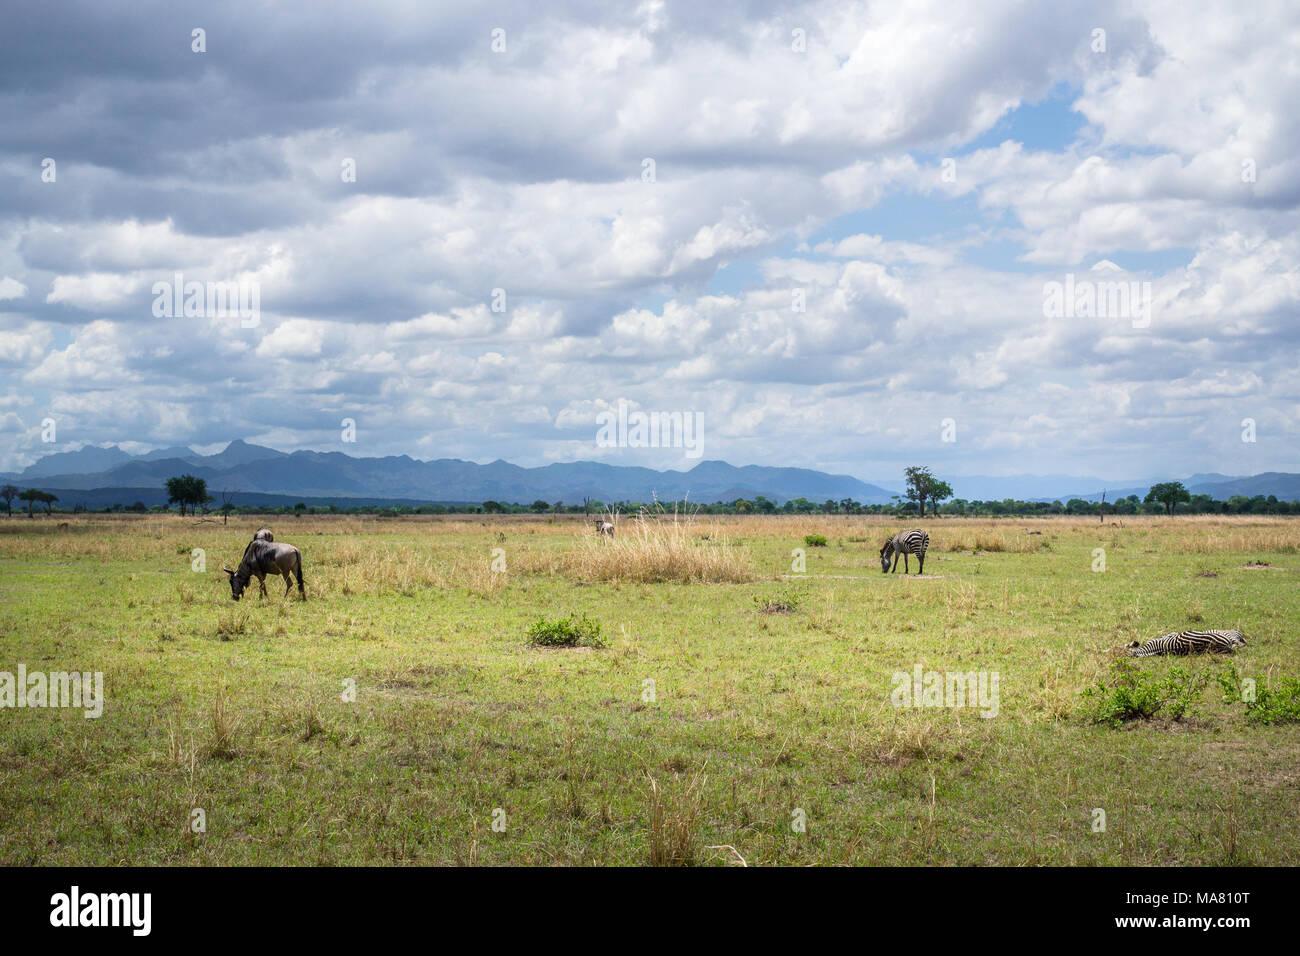 Safari, Tanzania, Travel in Africa, african lion safari african safari best african safari tours best place for safari - Stock Image